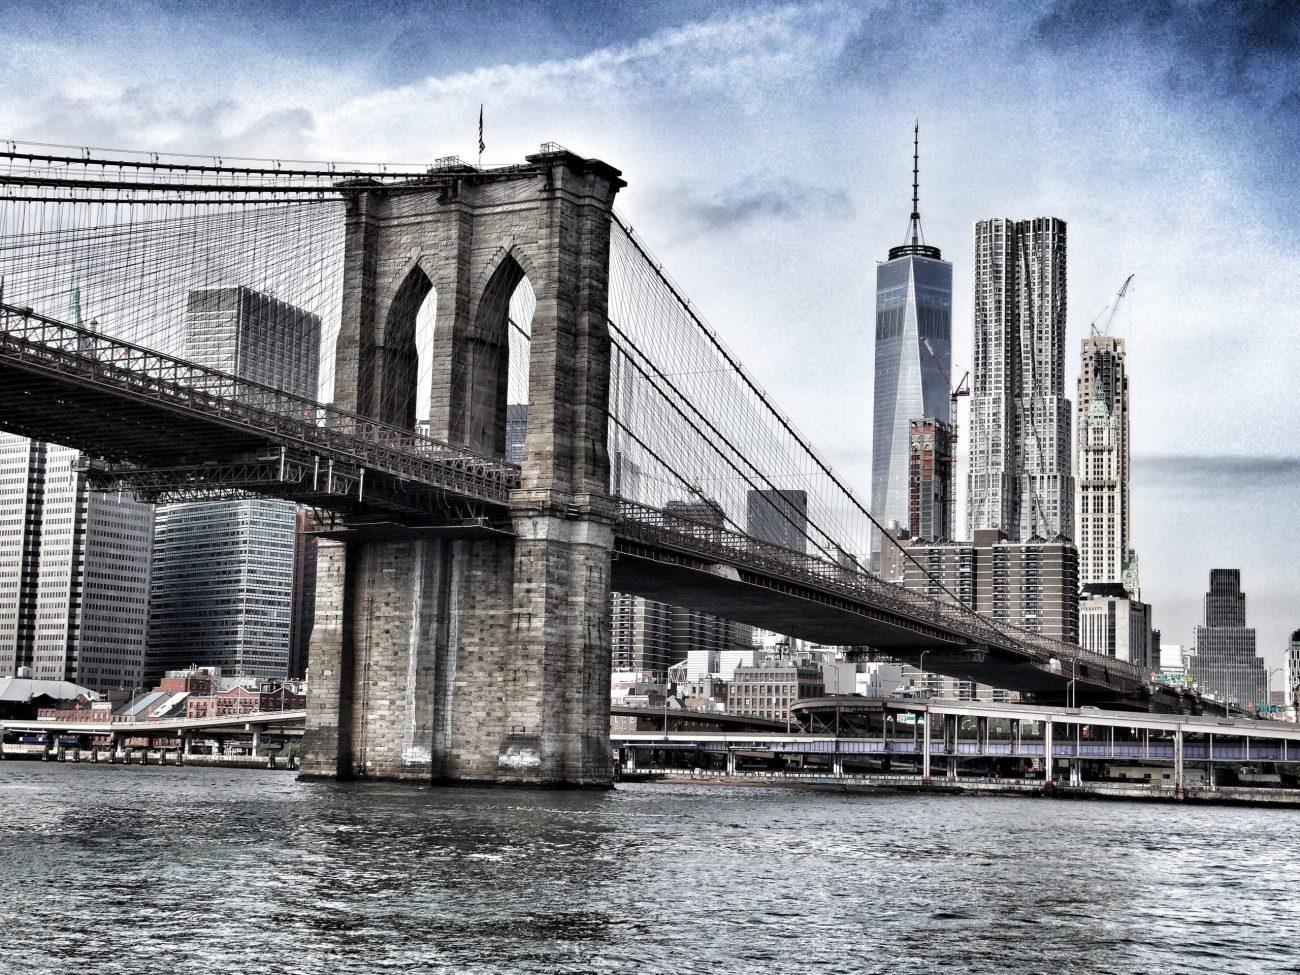 Brooklyn Bridge, New York, United States-unsplash